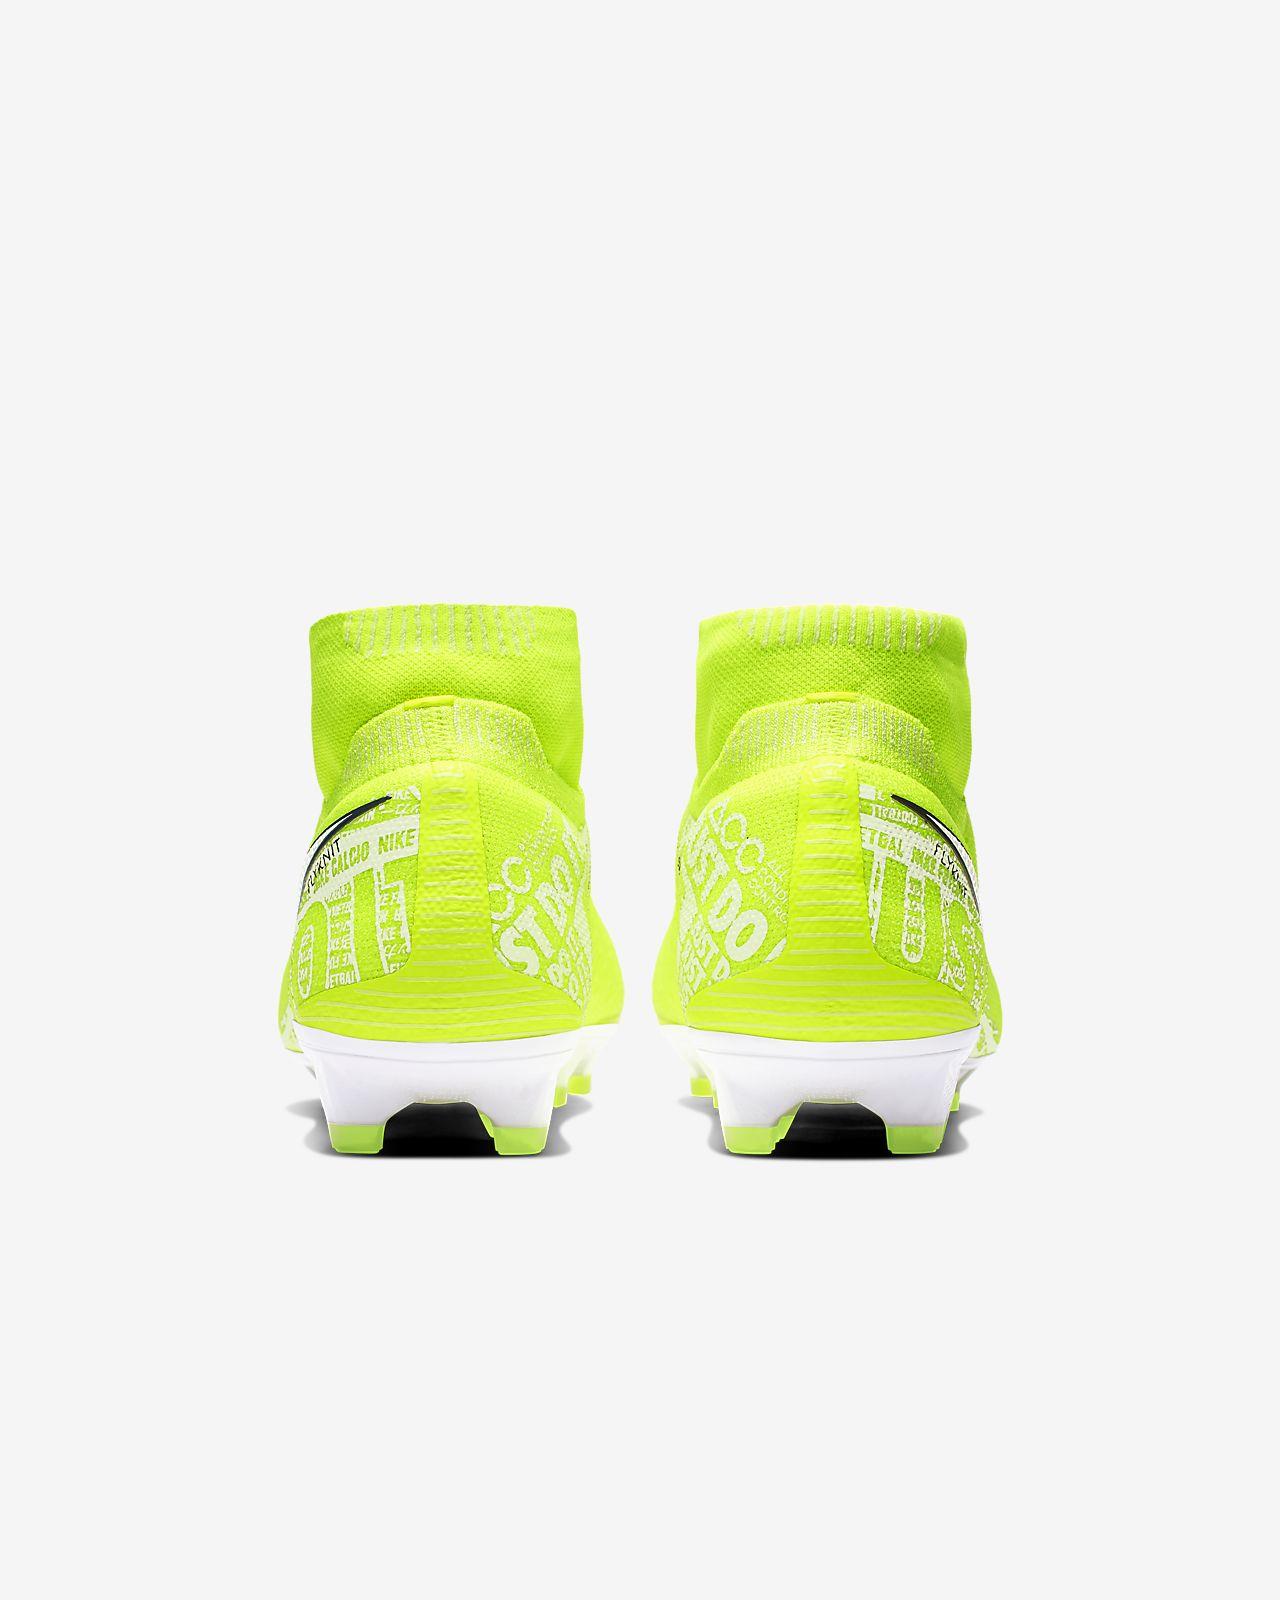 7c4fffea050 Nike Phantom Vision Elite Dynamic Fit FG Firm-Ground Soccer Cleat